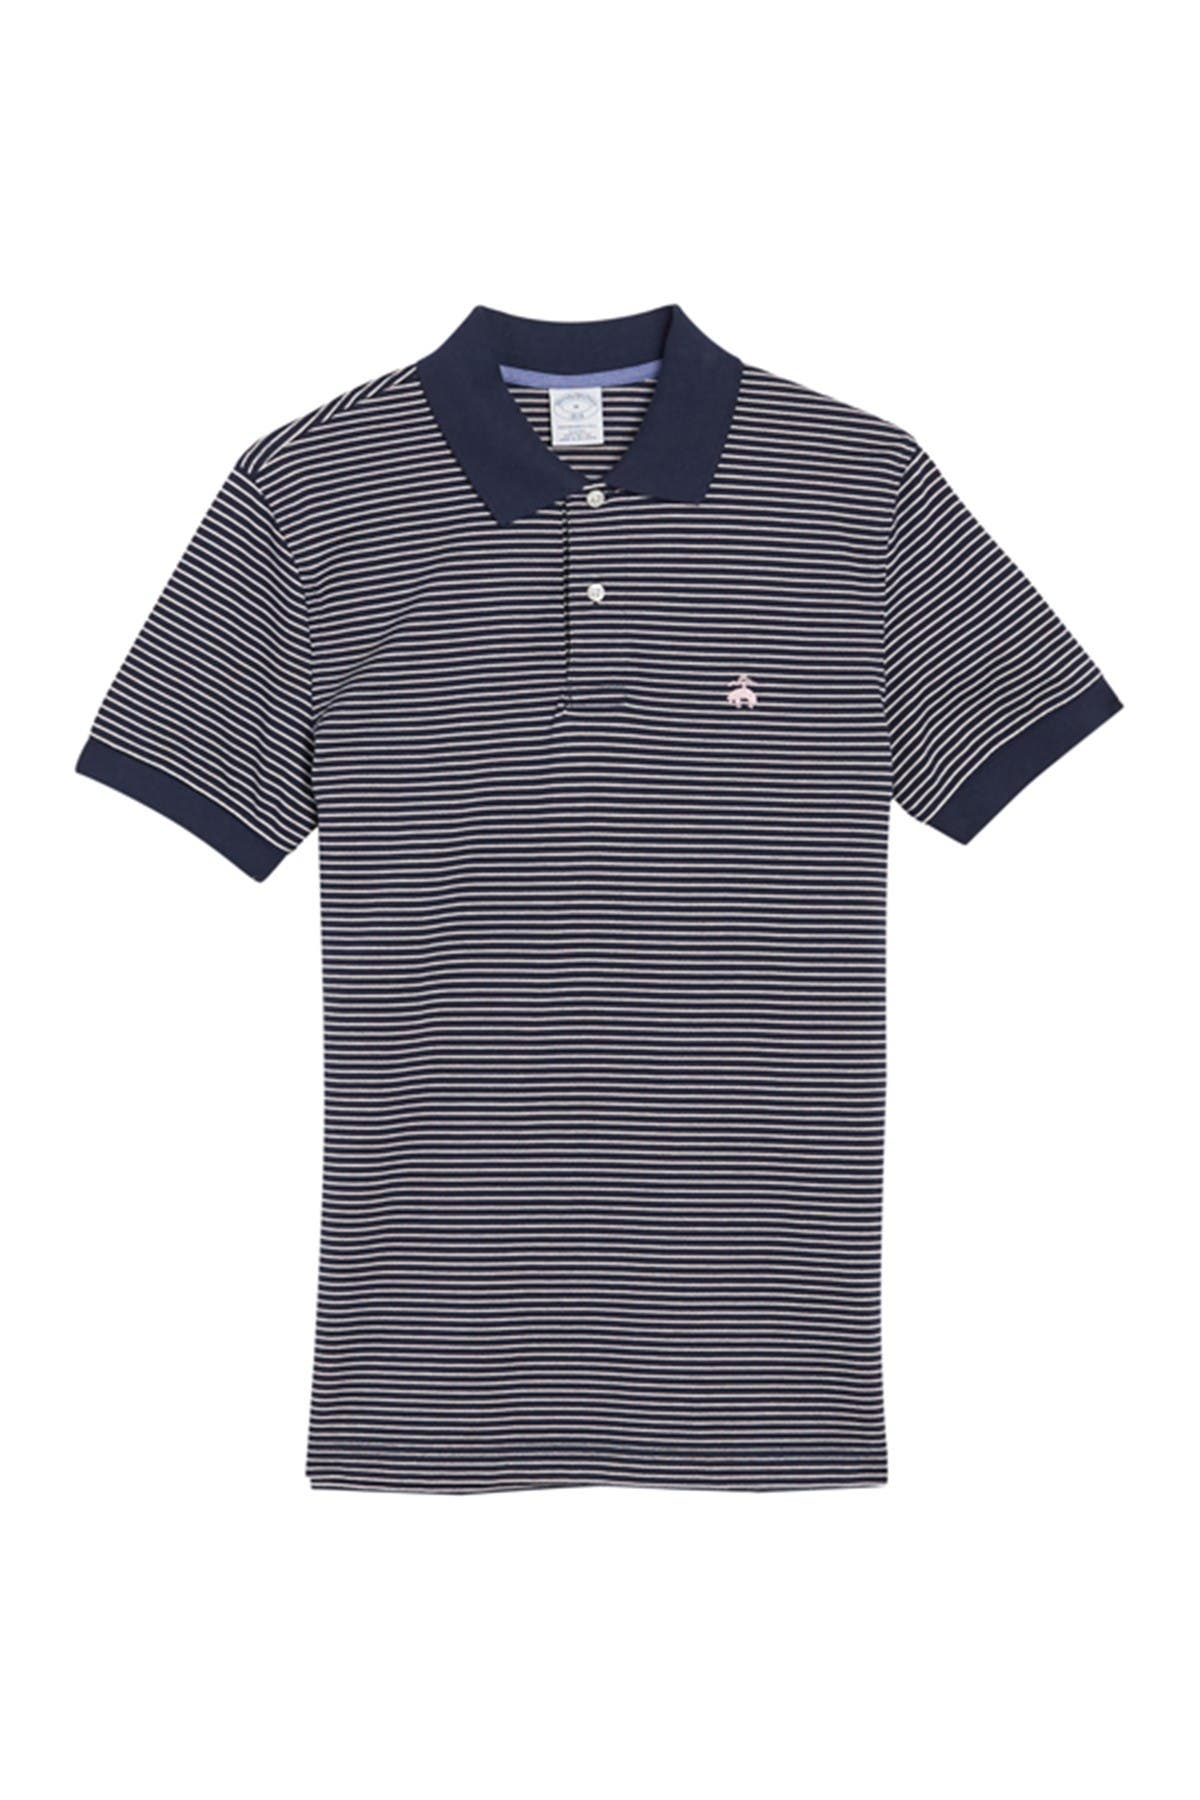 Brooks Brothers Pique Knit Stripe Print Polo